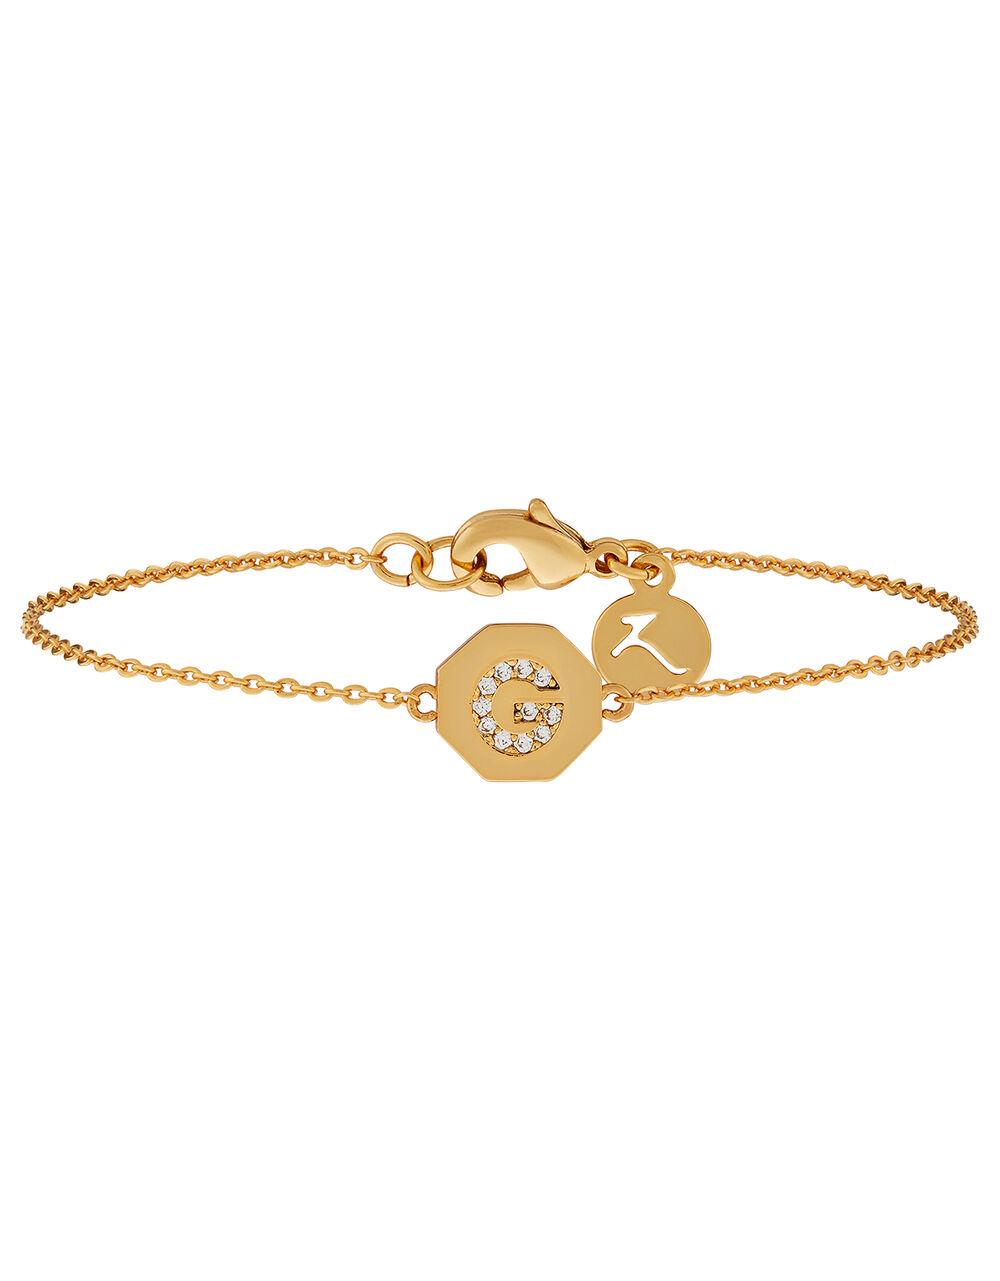 G Initial Hexagon Bracelet, , large